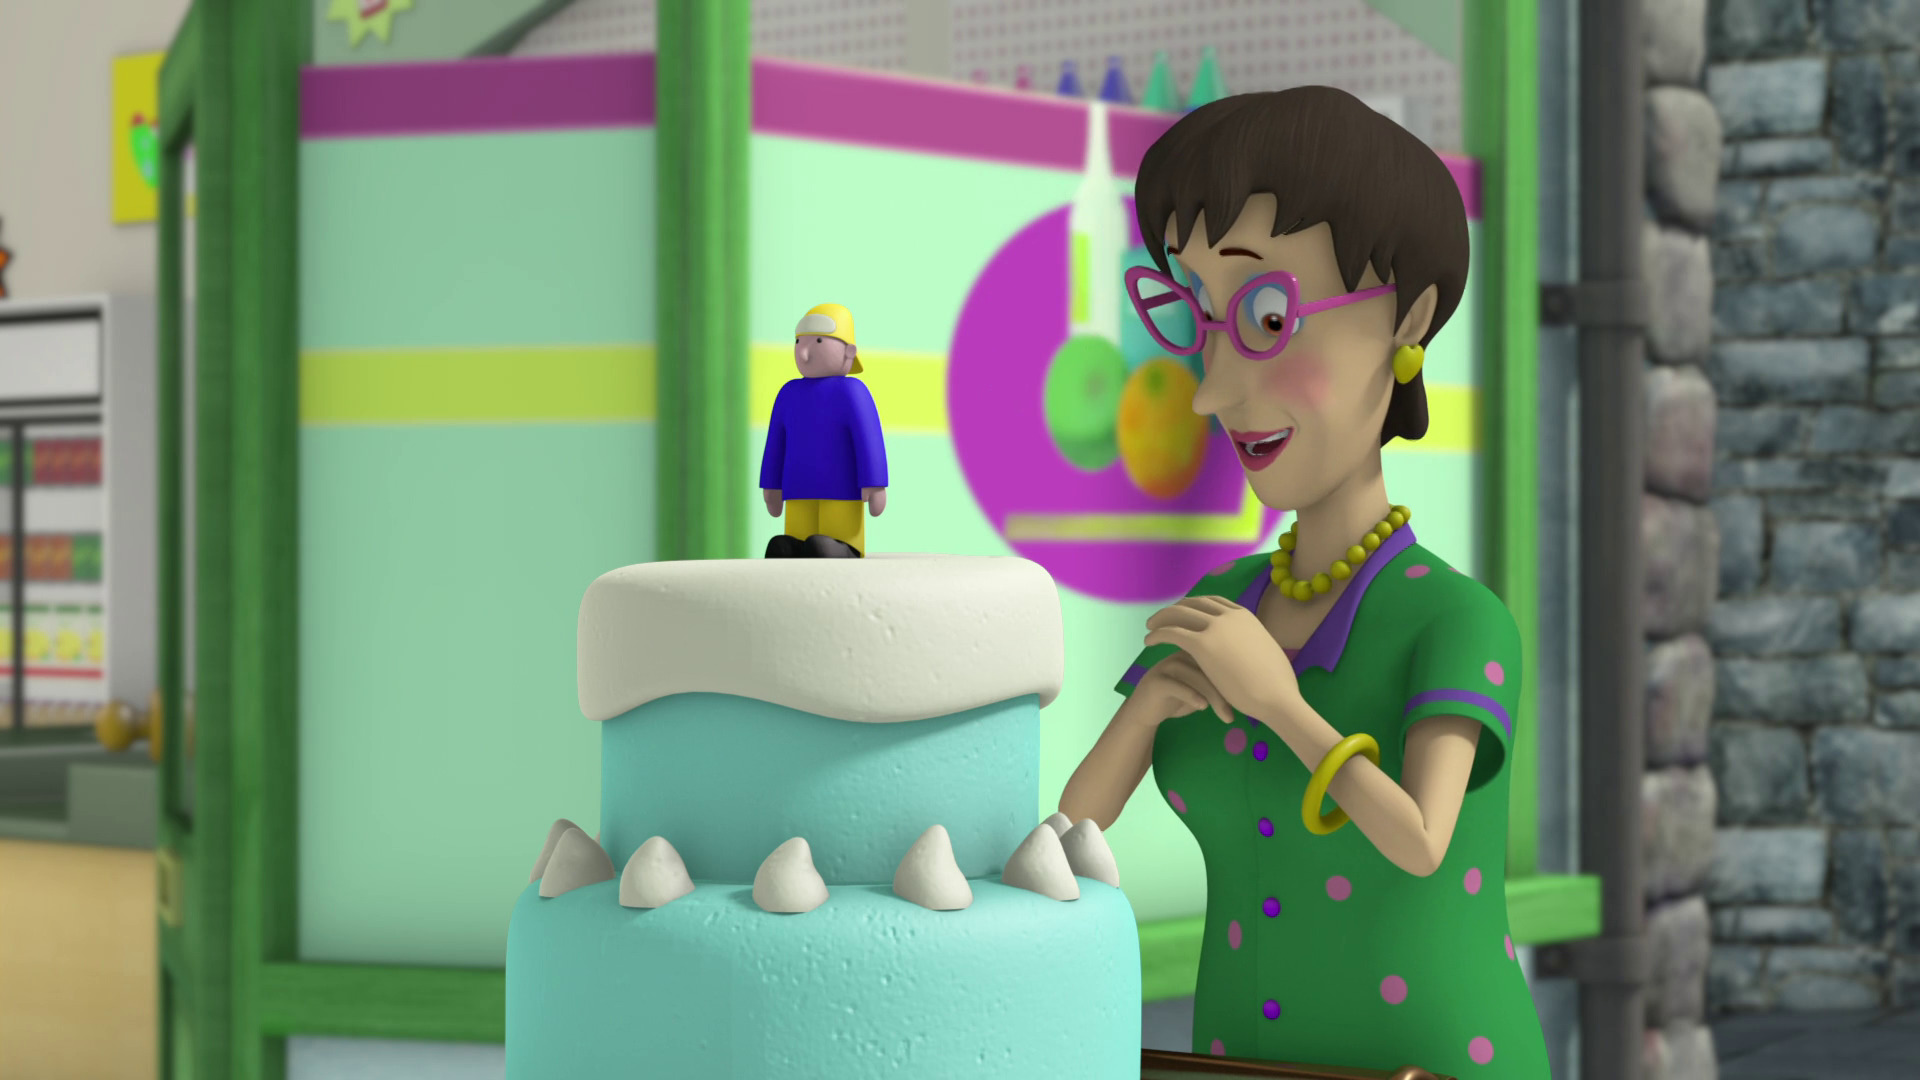 Temporada 10 T10 - C2: El cumpleaños de Sam